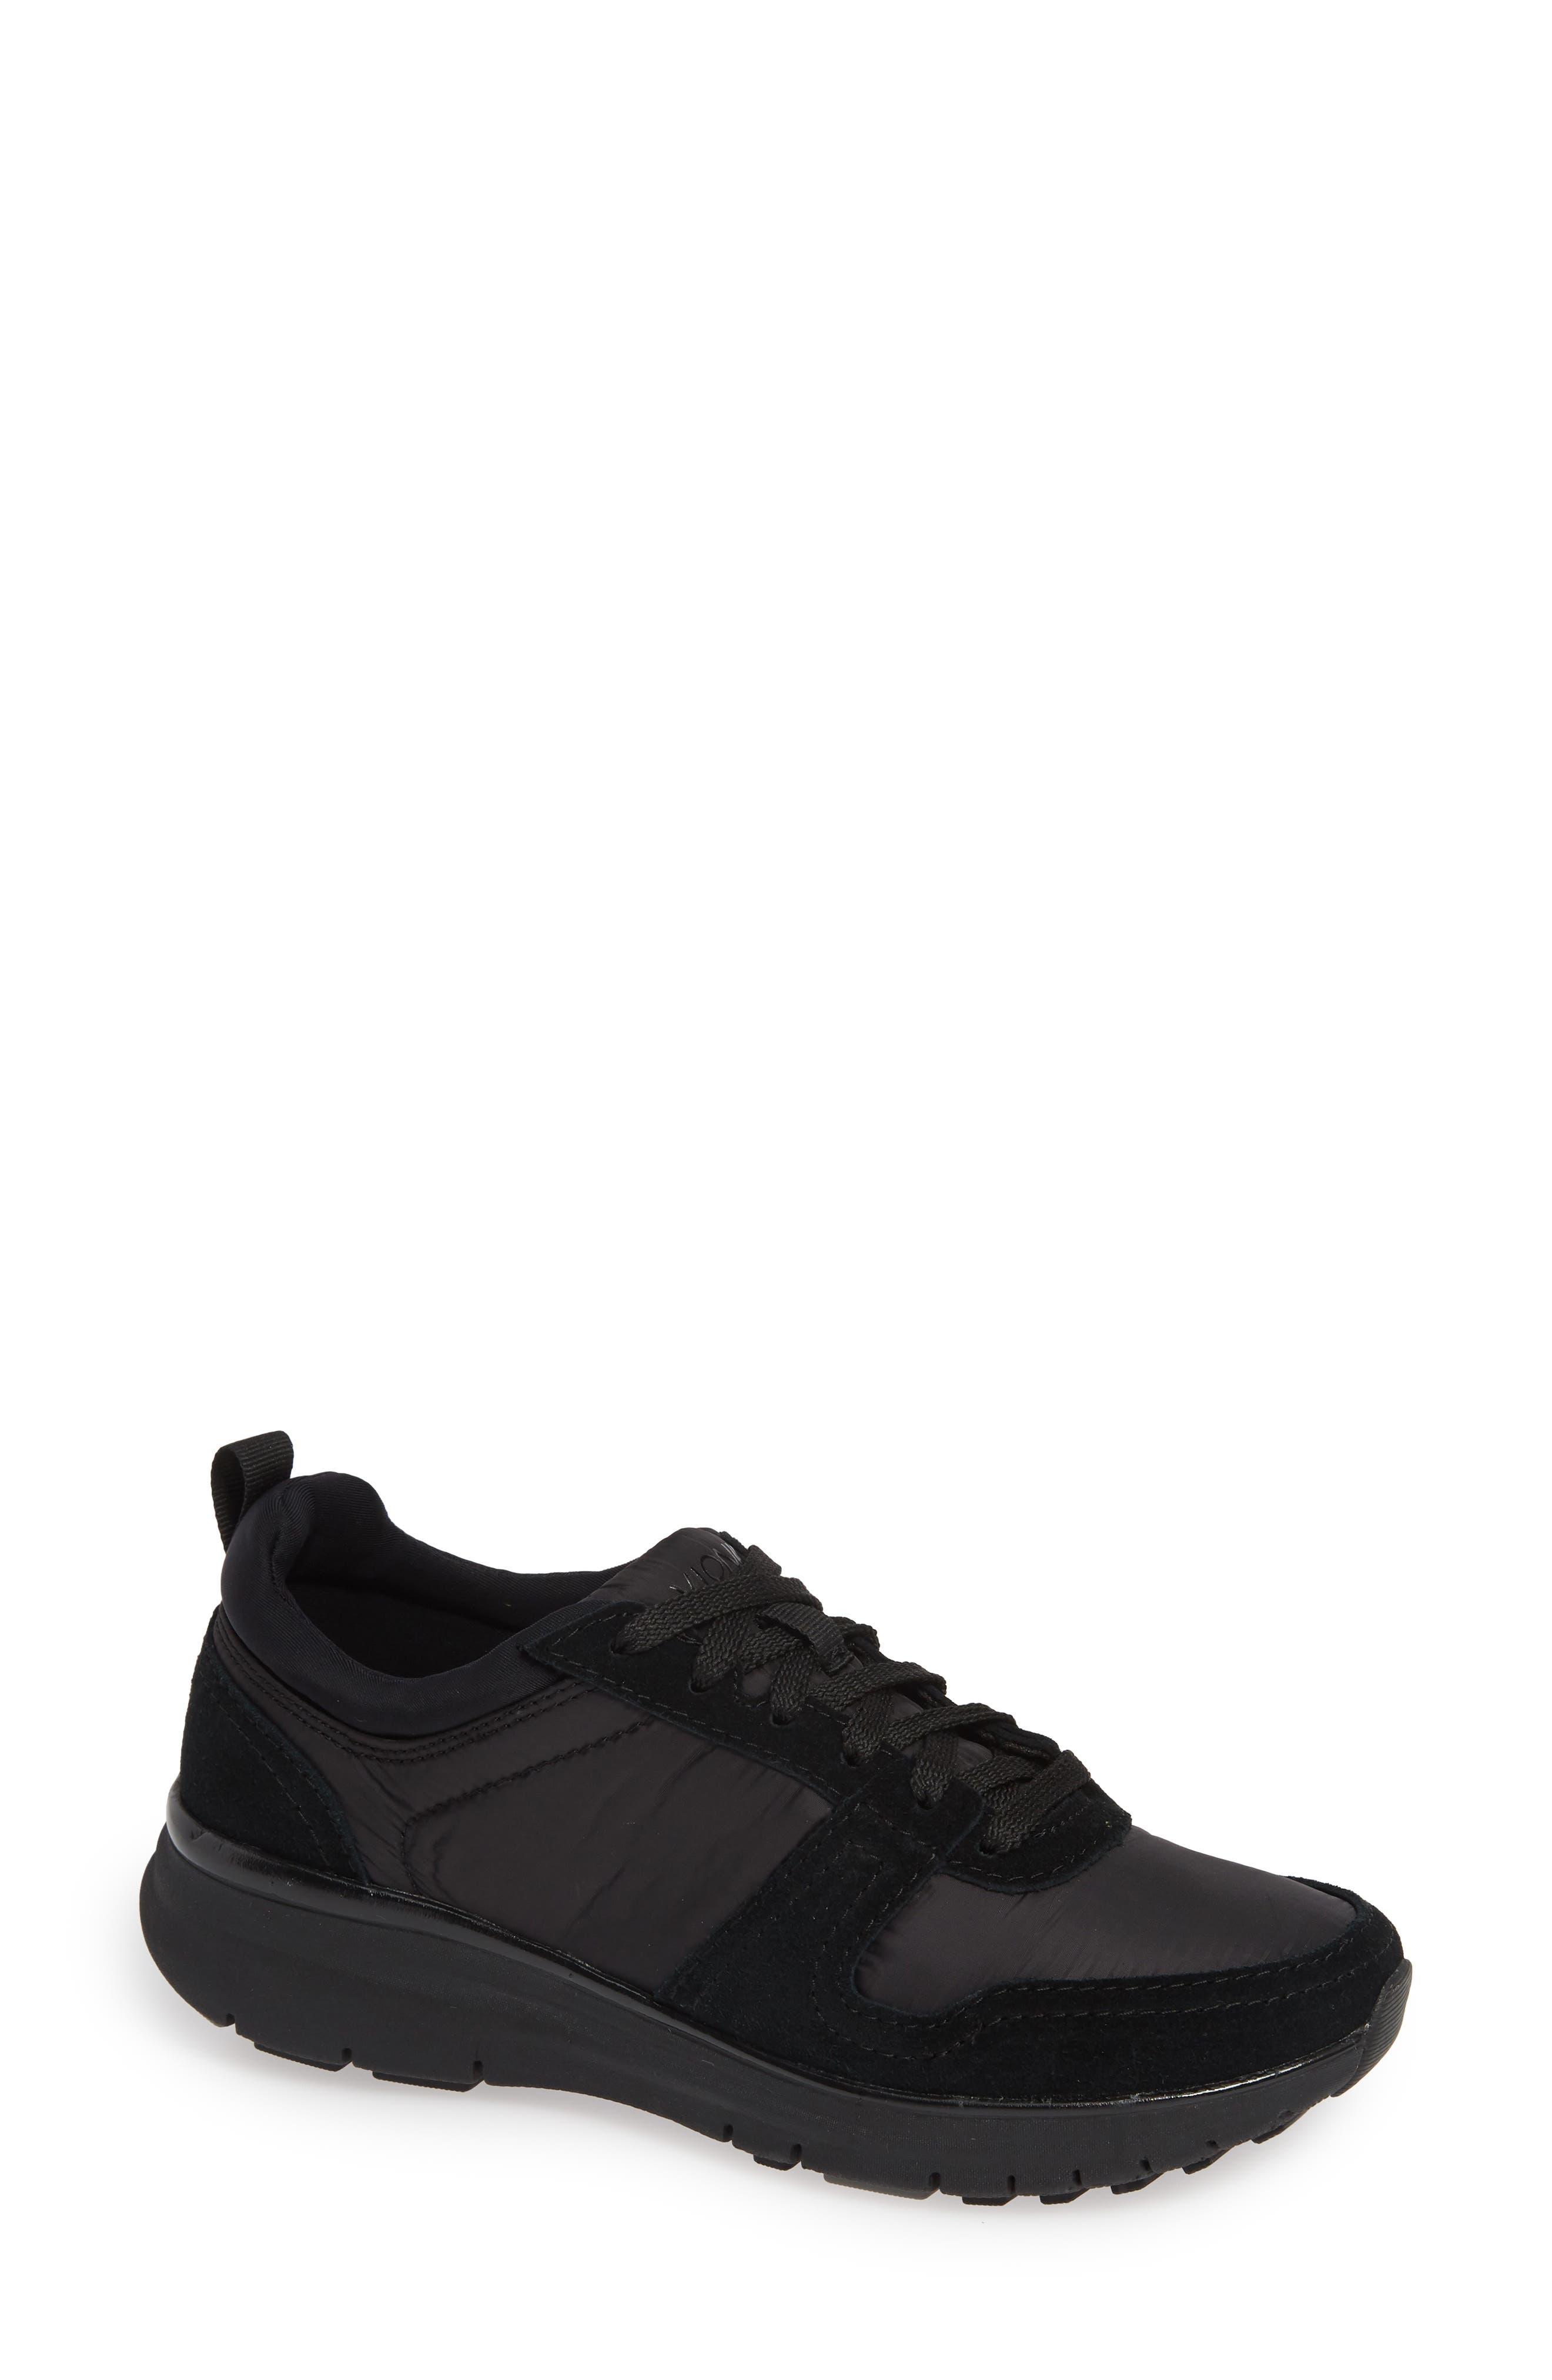 VIONIC,                             Emerson Low Top Sneaker,                             Main thumbnail 1, color,                             001